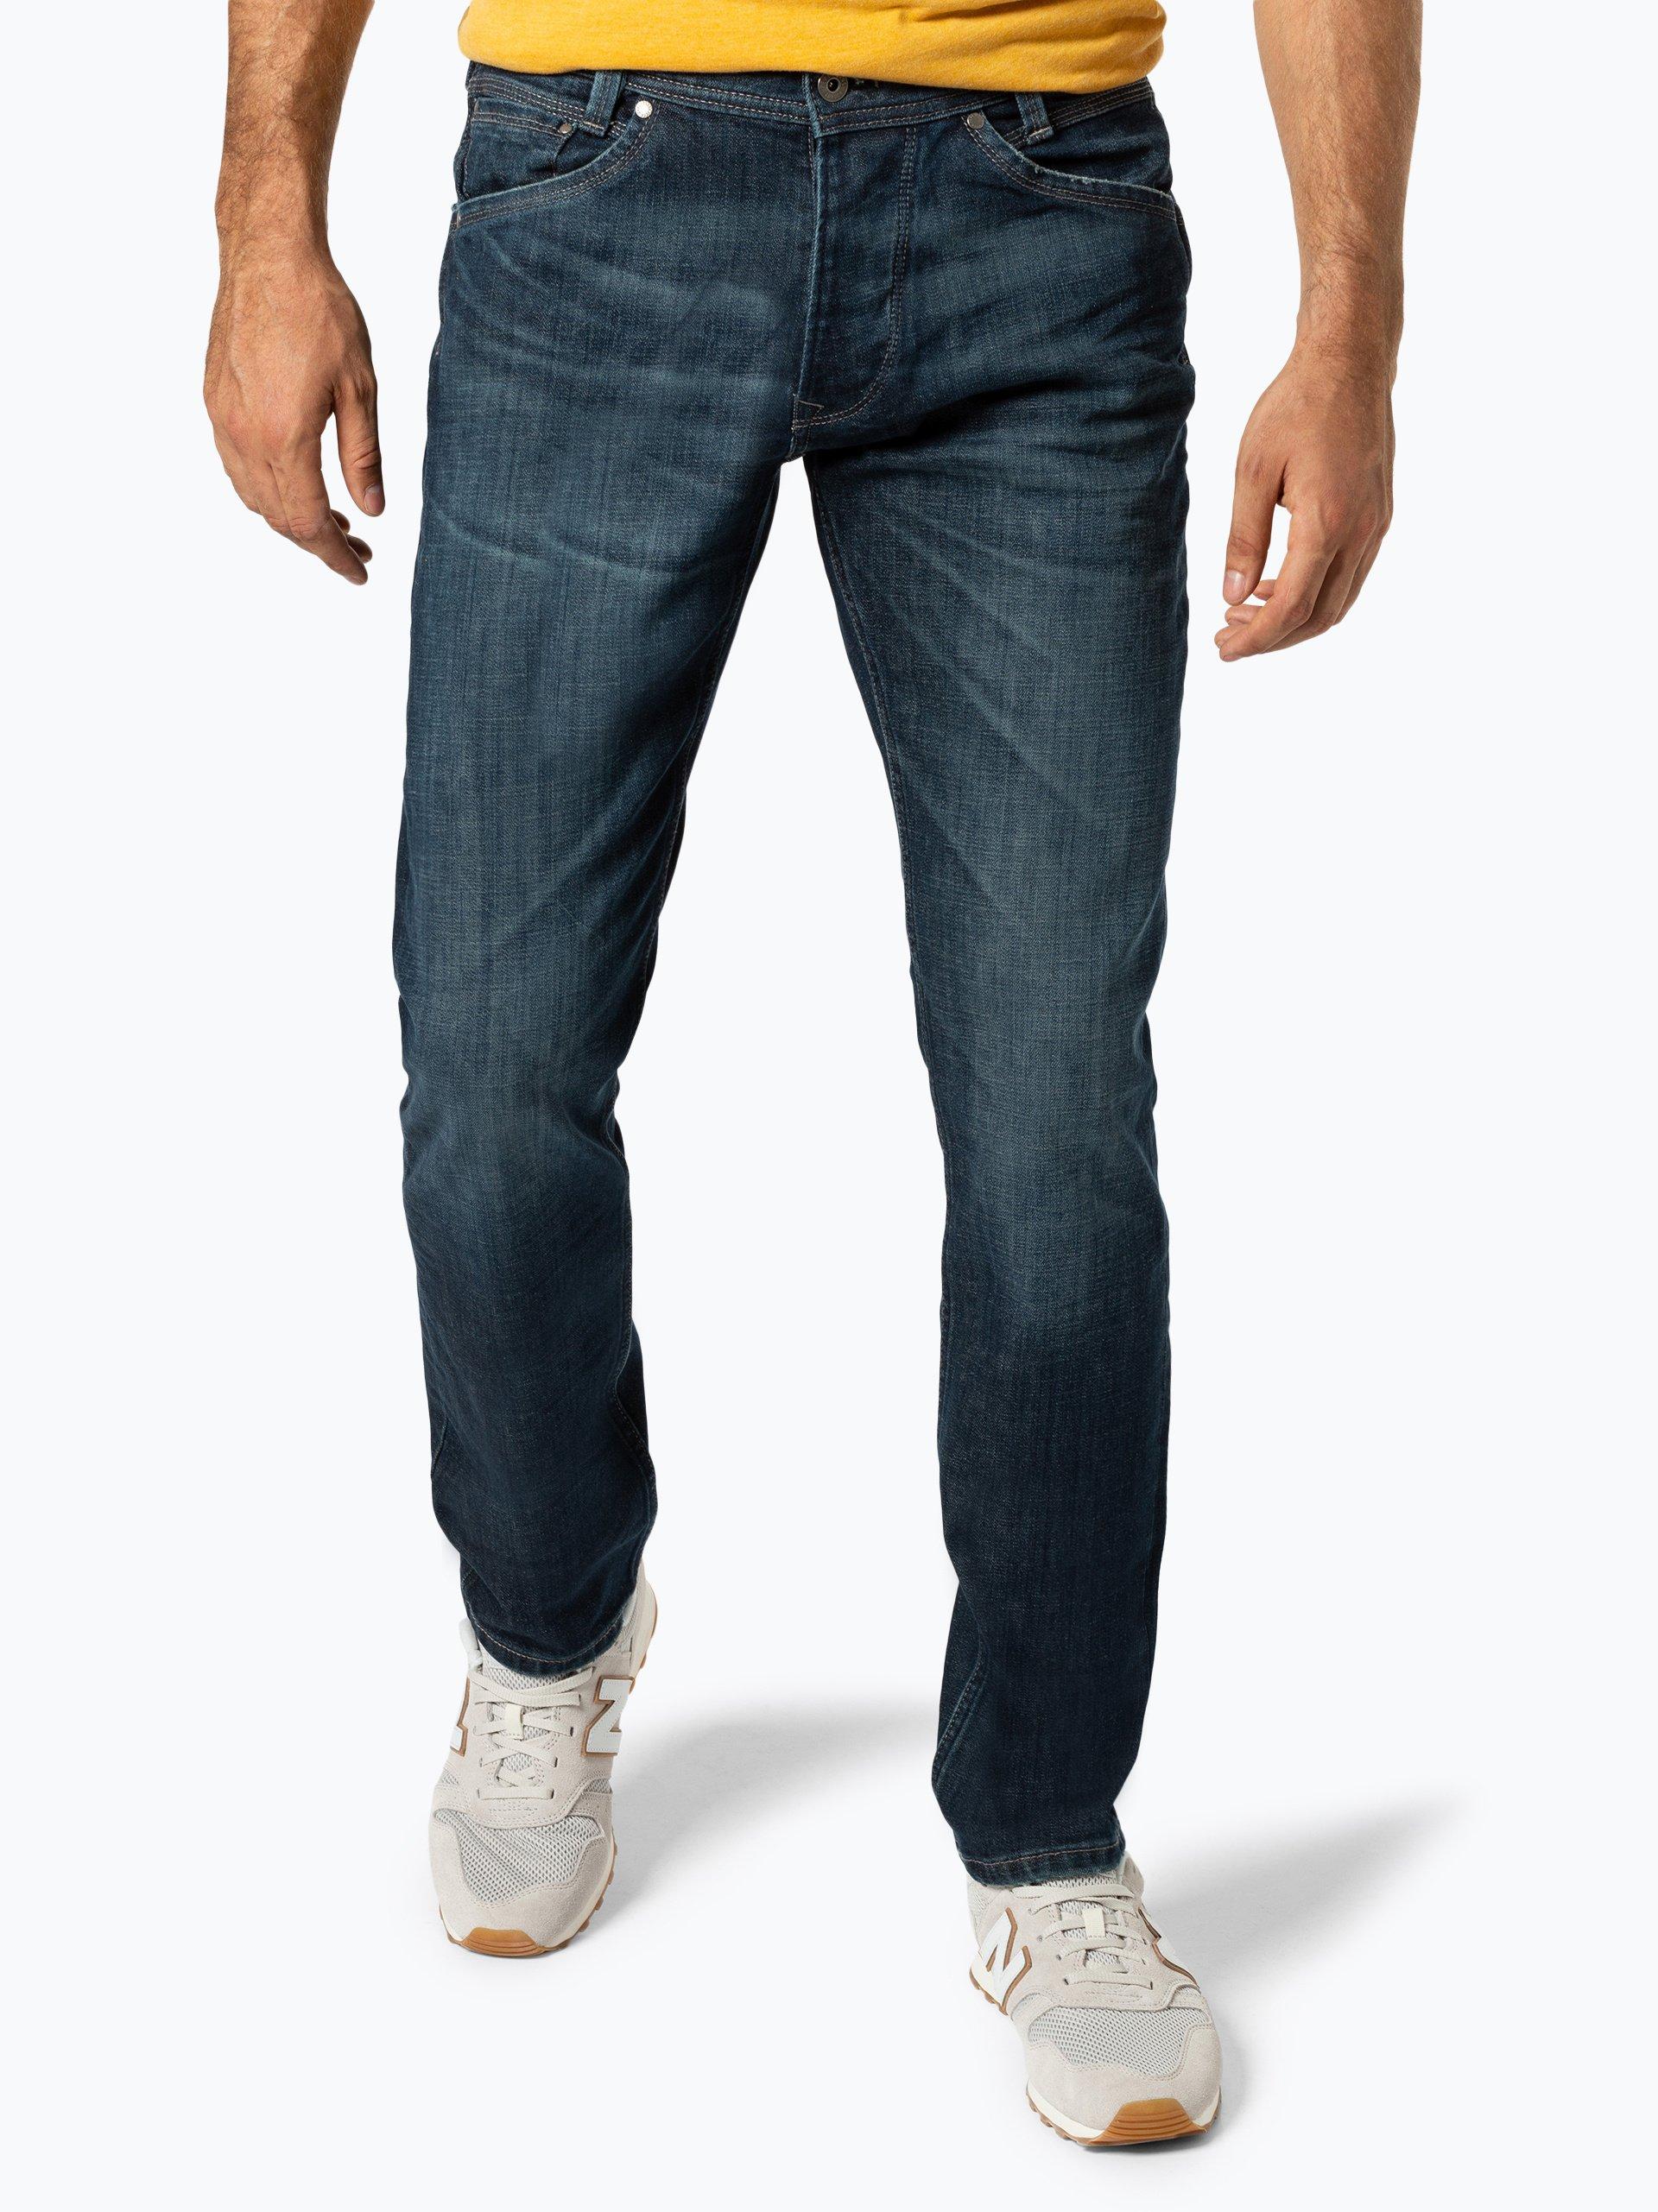 Pepe Jeans Herren Jeans - Spike